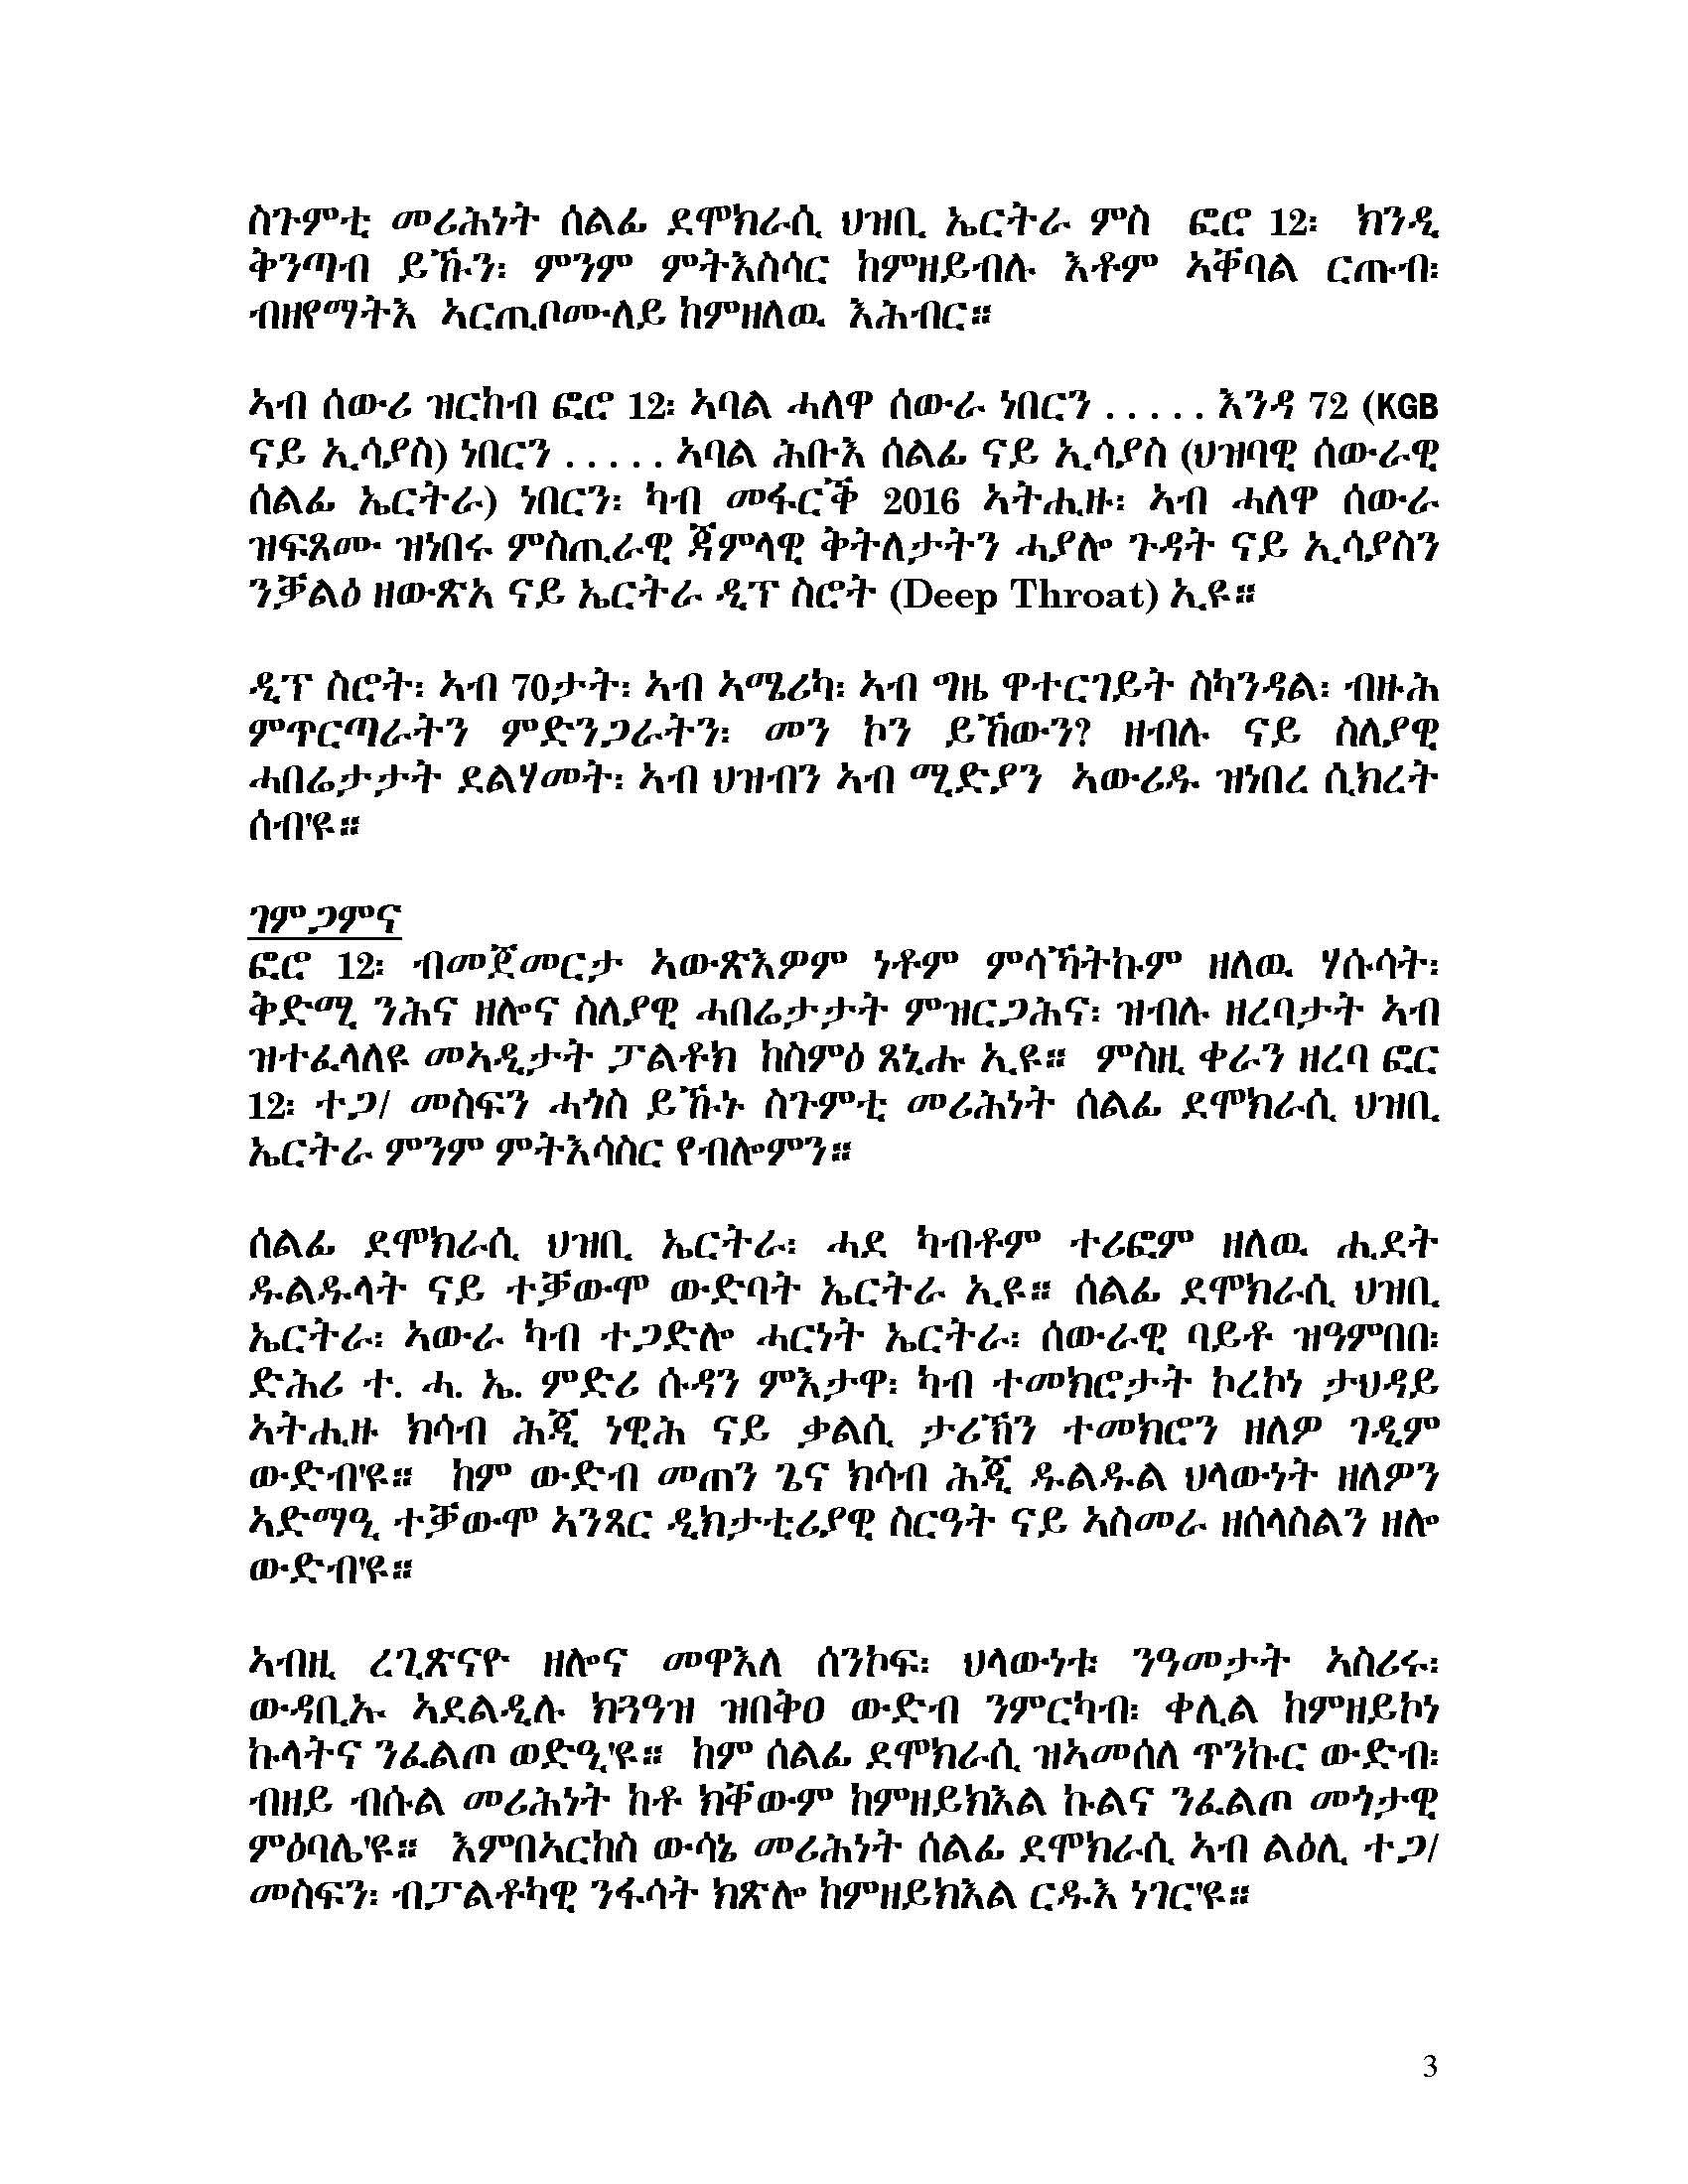 mesfun-fired-by-epdp-26nov20161_page_3